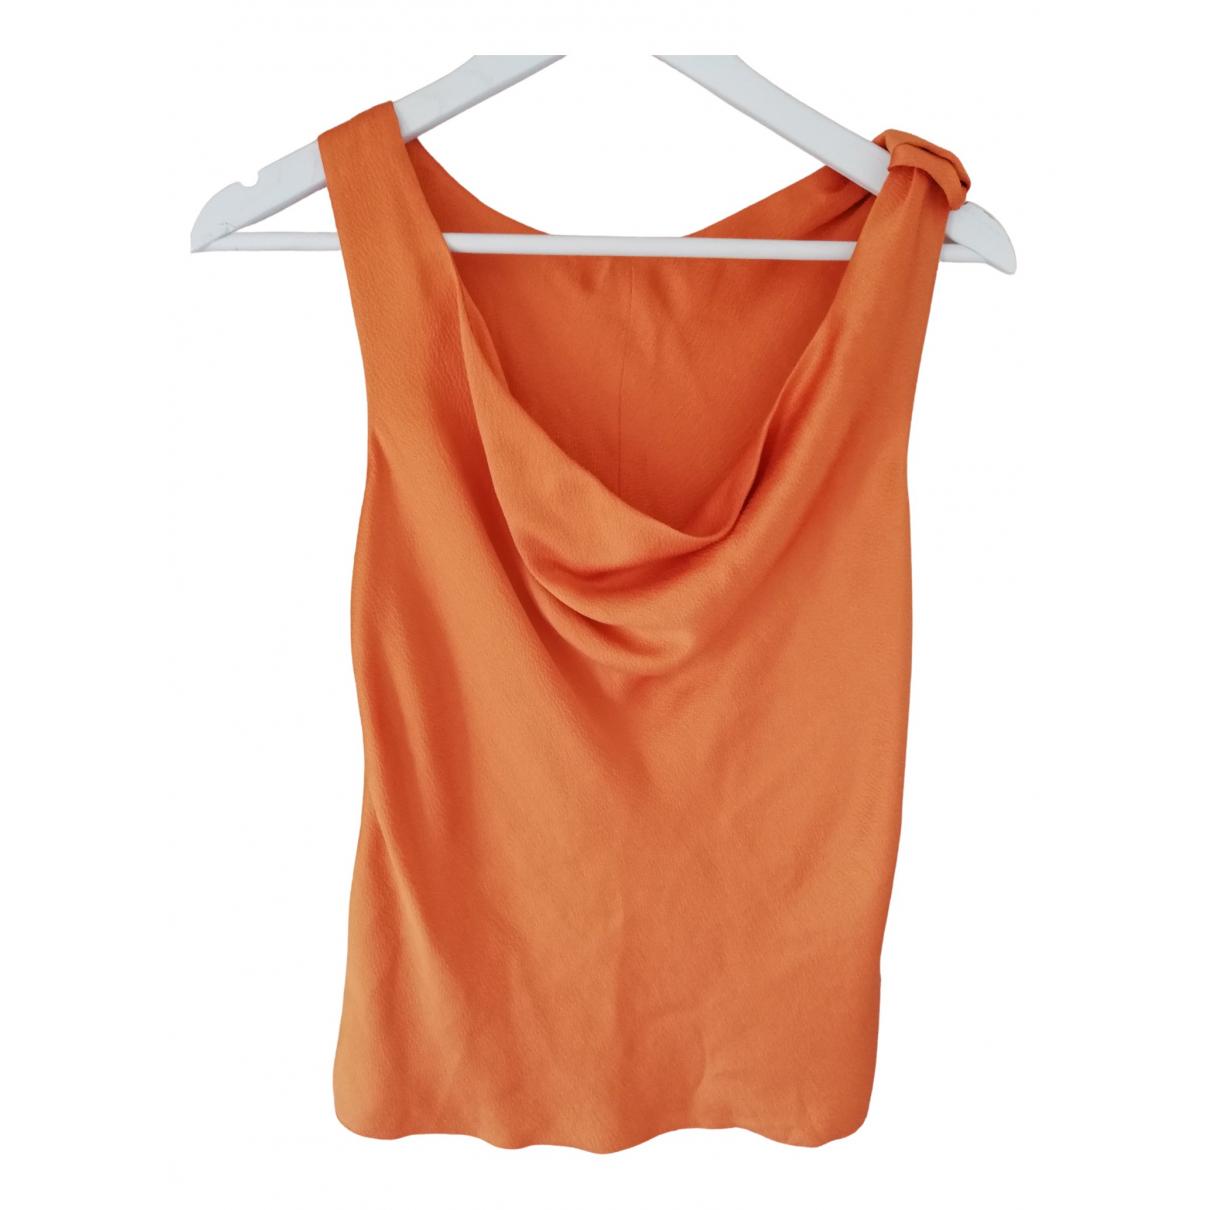 Giorgio Armani - Top   pour femme - orange